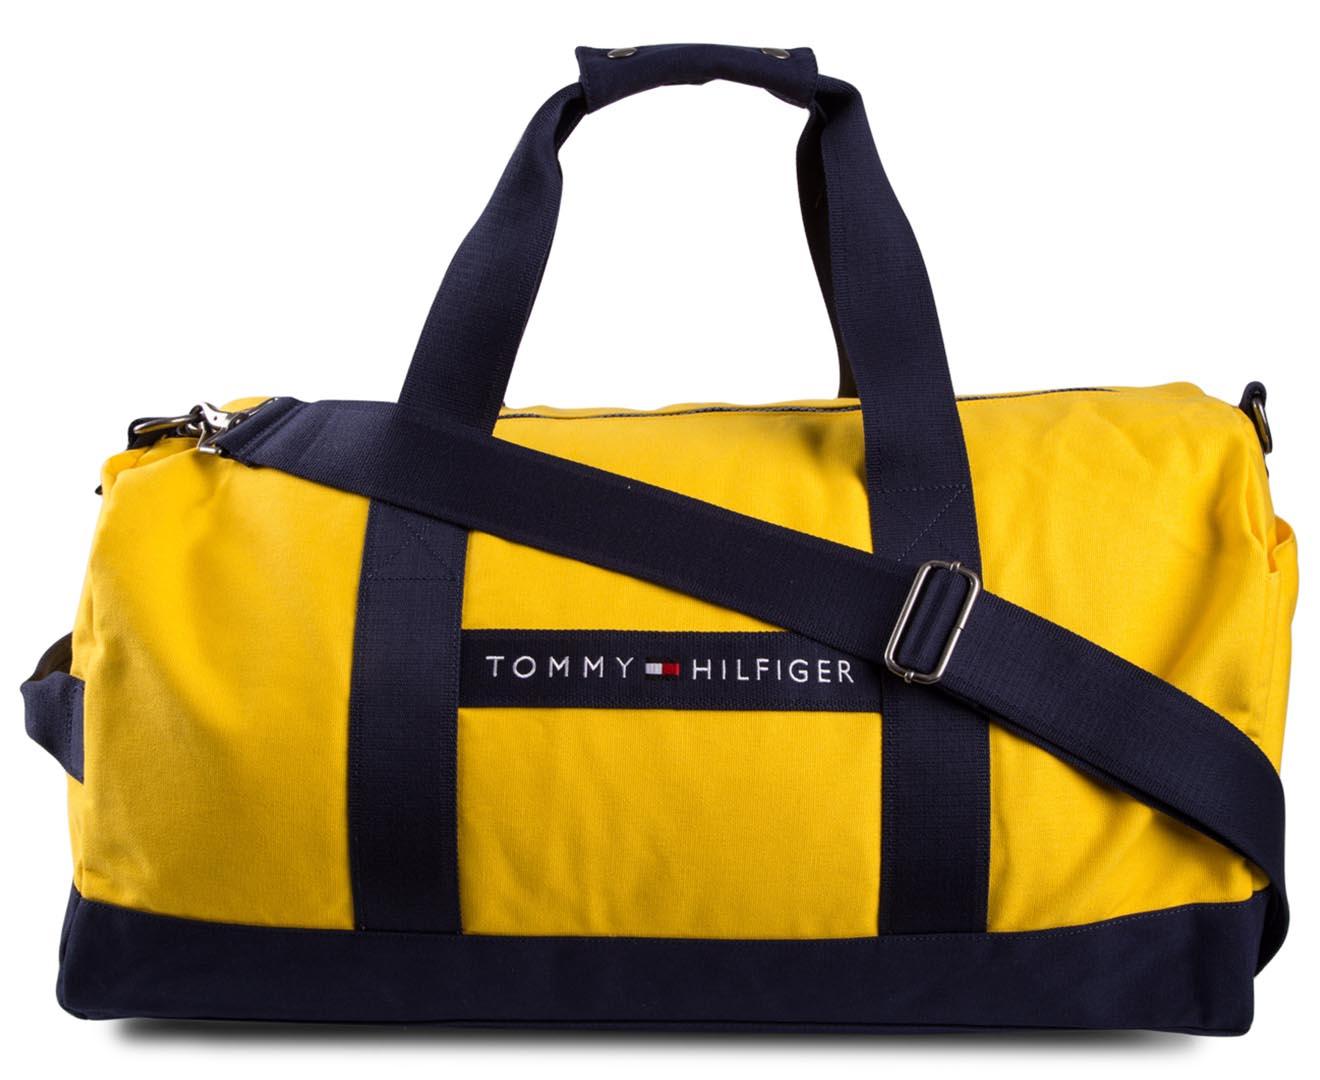 Tommy Hilfiger Sport Duffle Bag Yellow Navy Catch Com Au